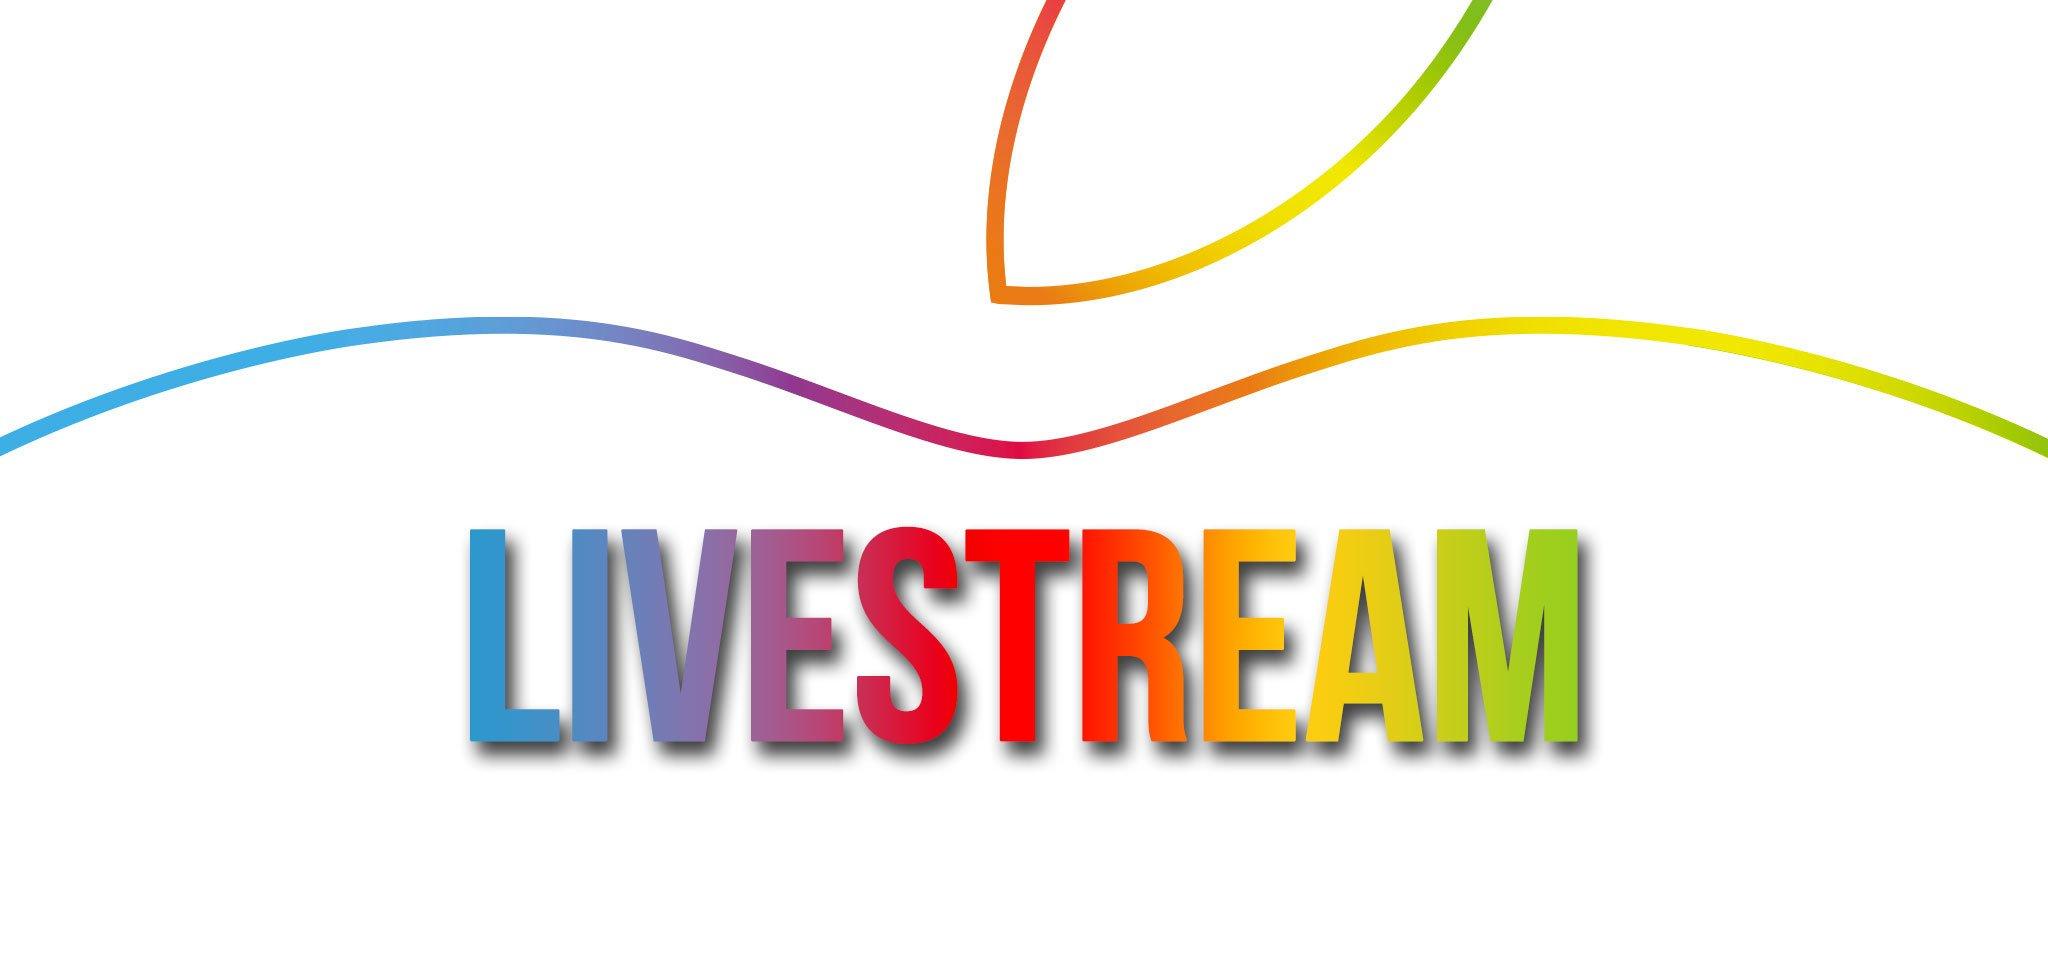 HEUTE Livestream Apple Keynote: iPad Air 2 & Retina iMac? 7